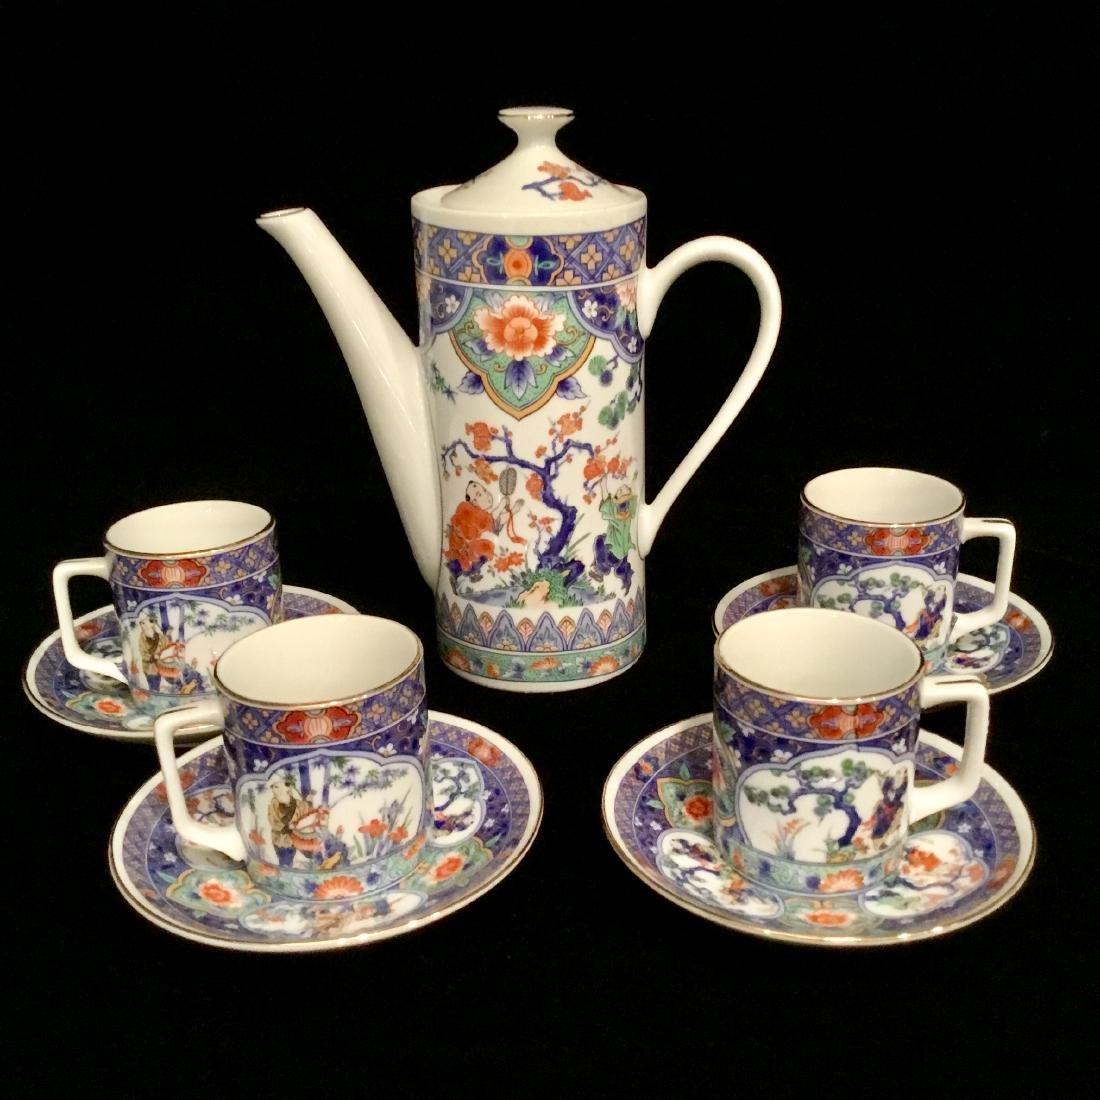 ASIAN CERAMIC TEA SET MARKED